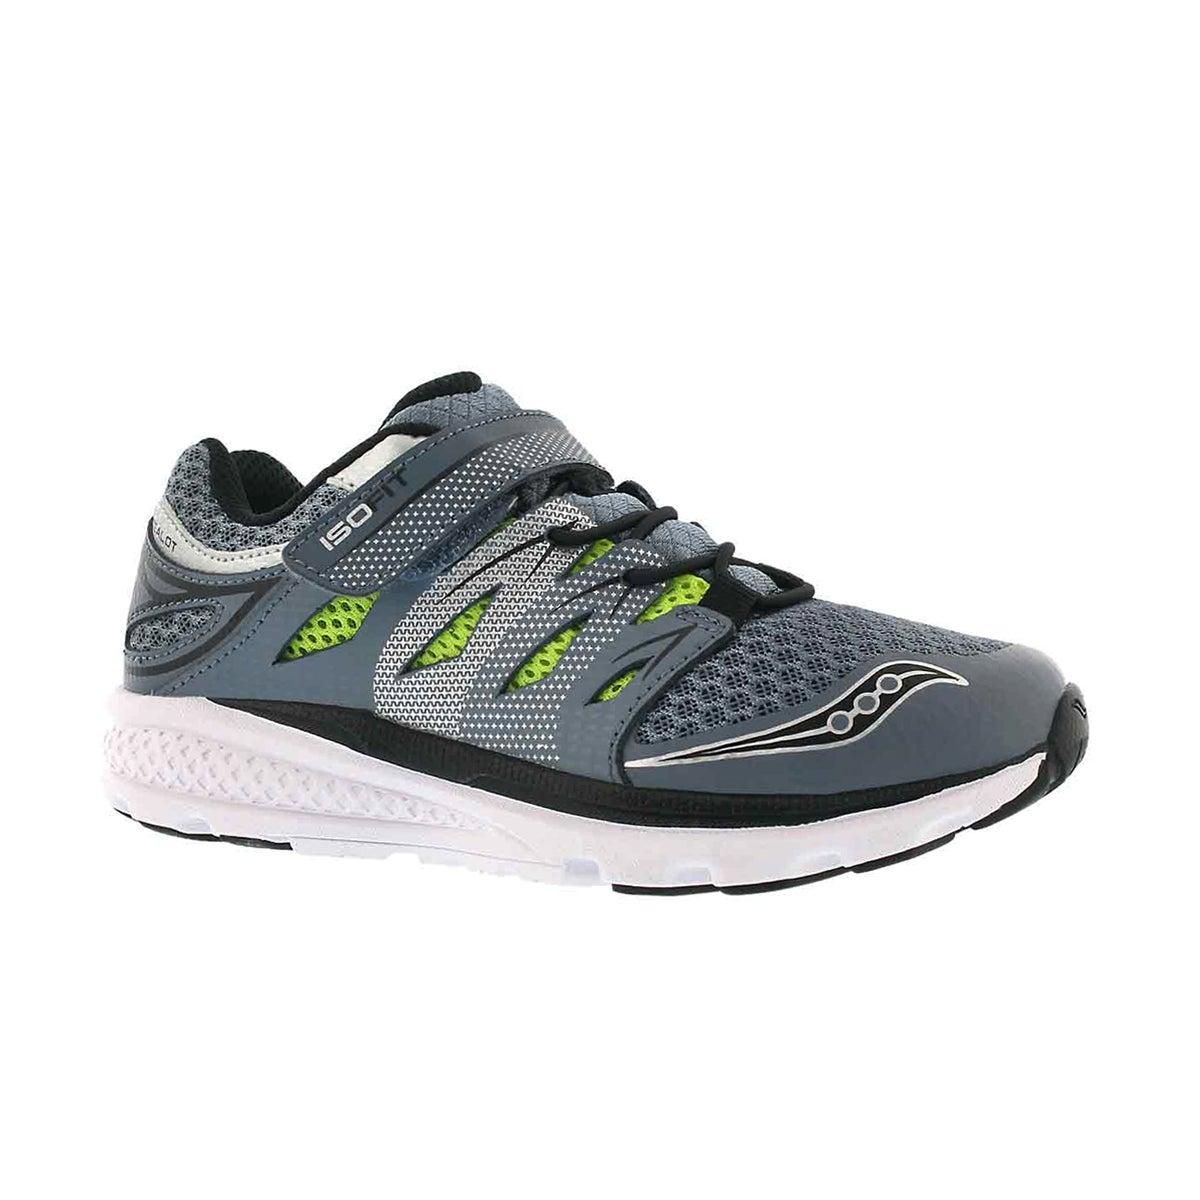 Boys' ZEALOT 2 grey running shoe